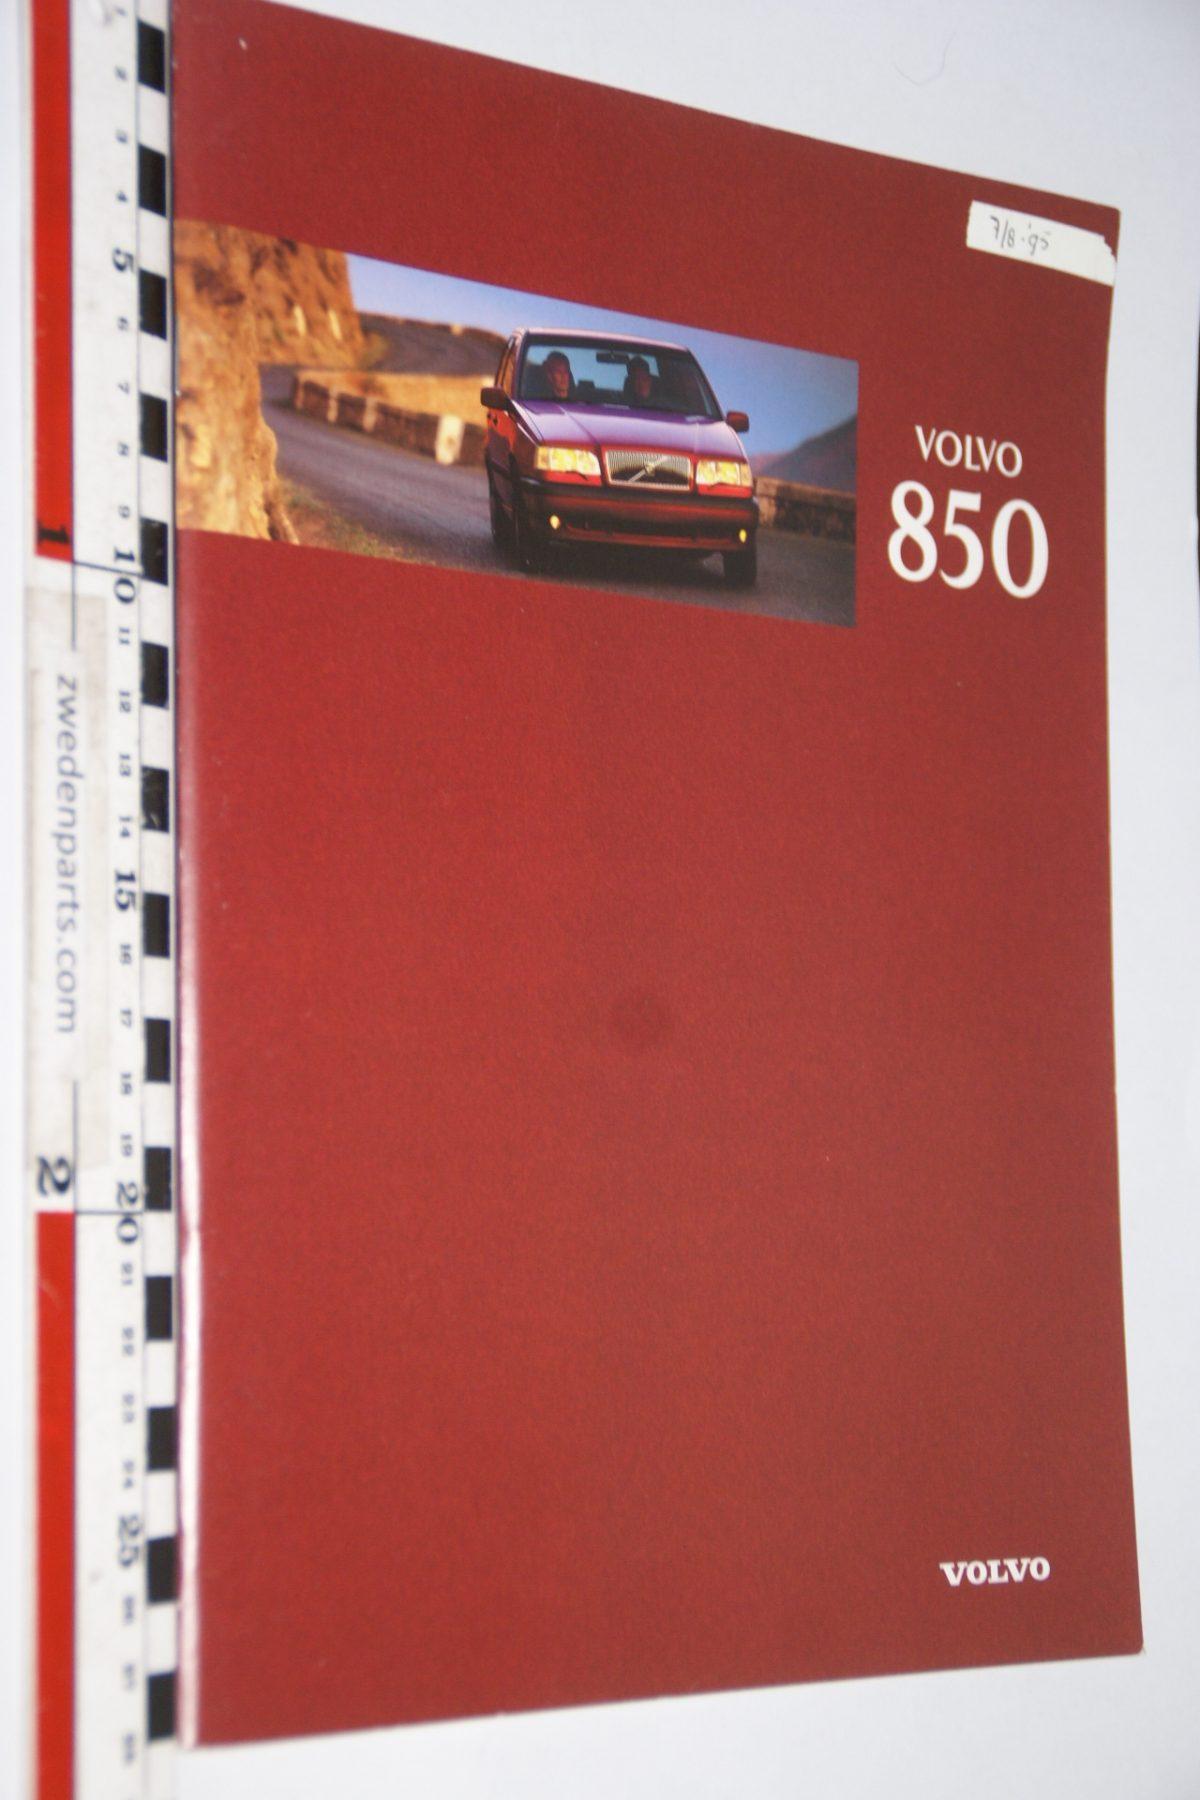 DSC06296 1996 brochure Volvo 850 nr MSPV 7455-96